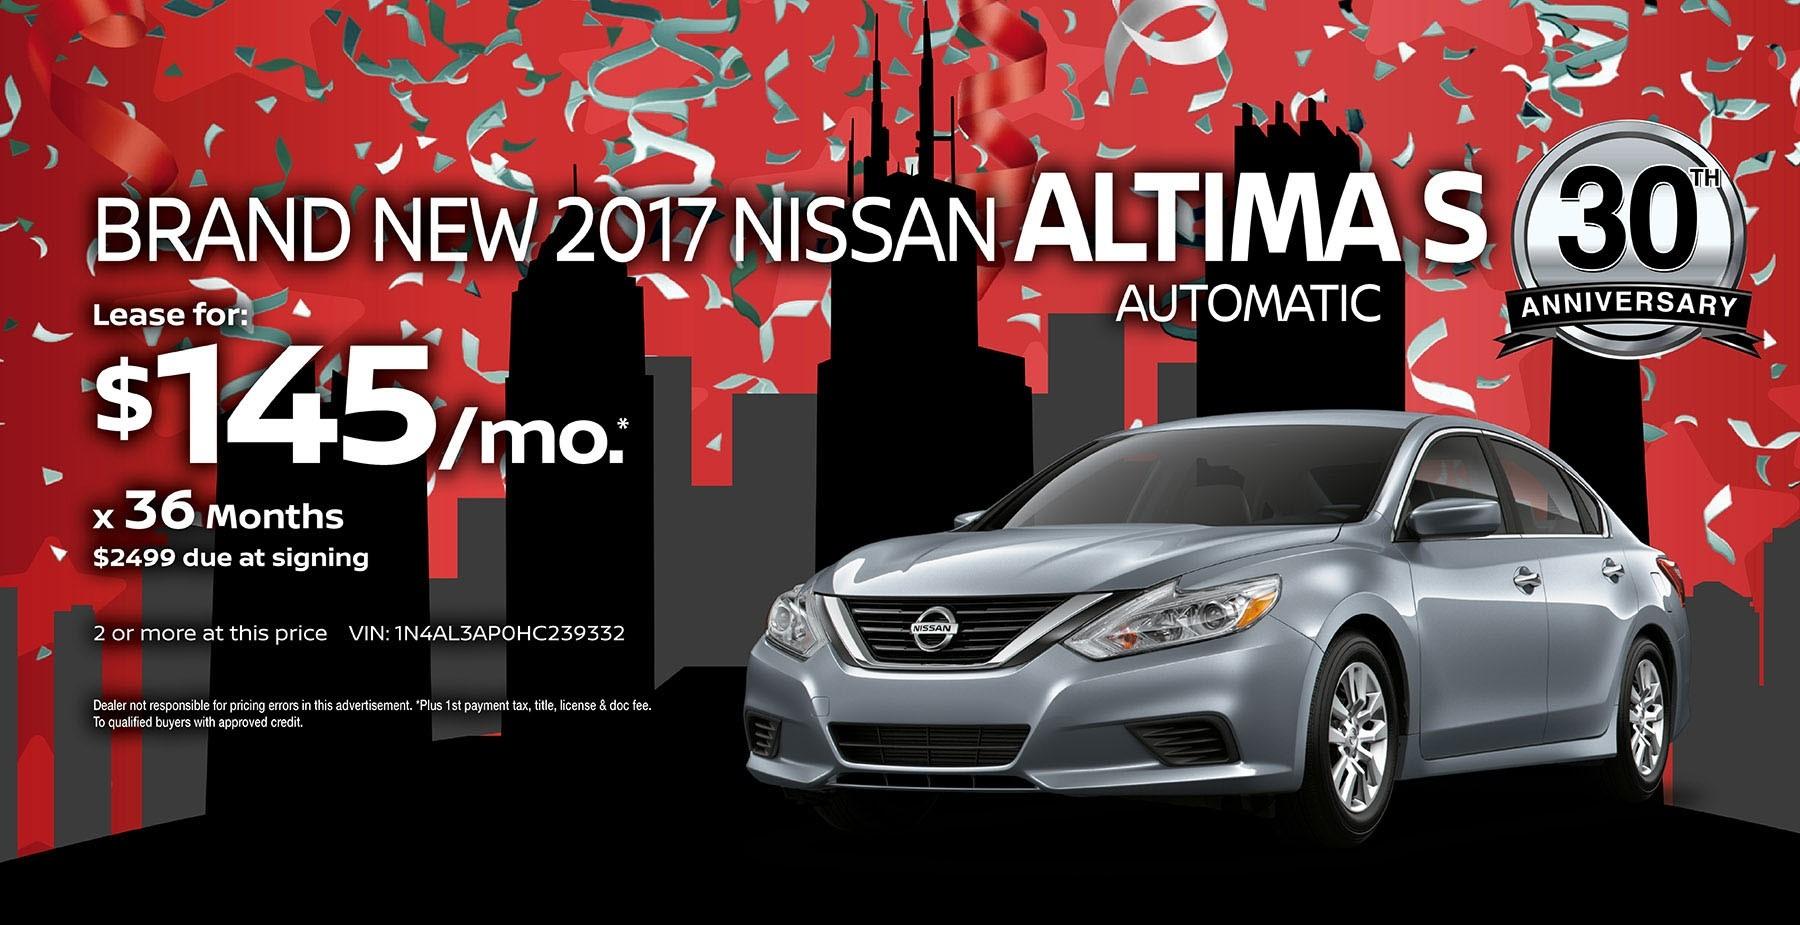 2017 Nissan Altima July Sale at Star Nissan